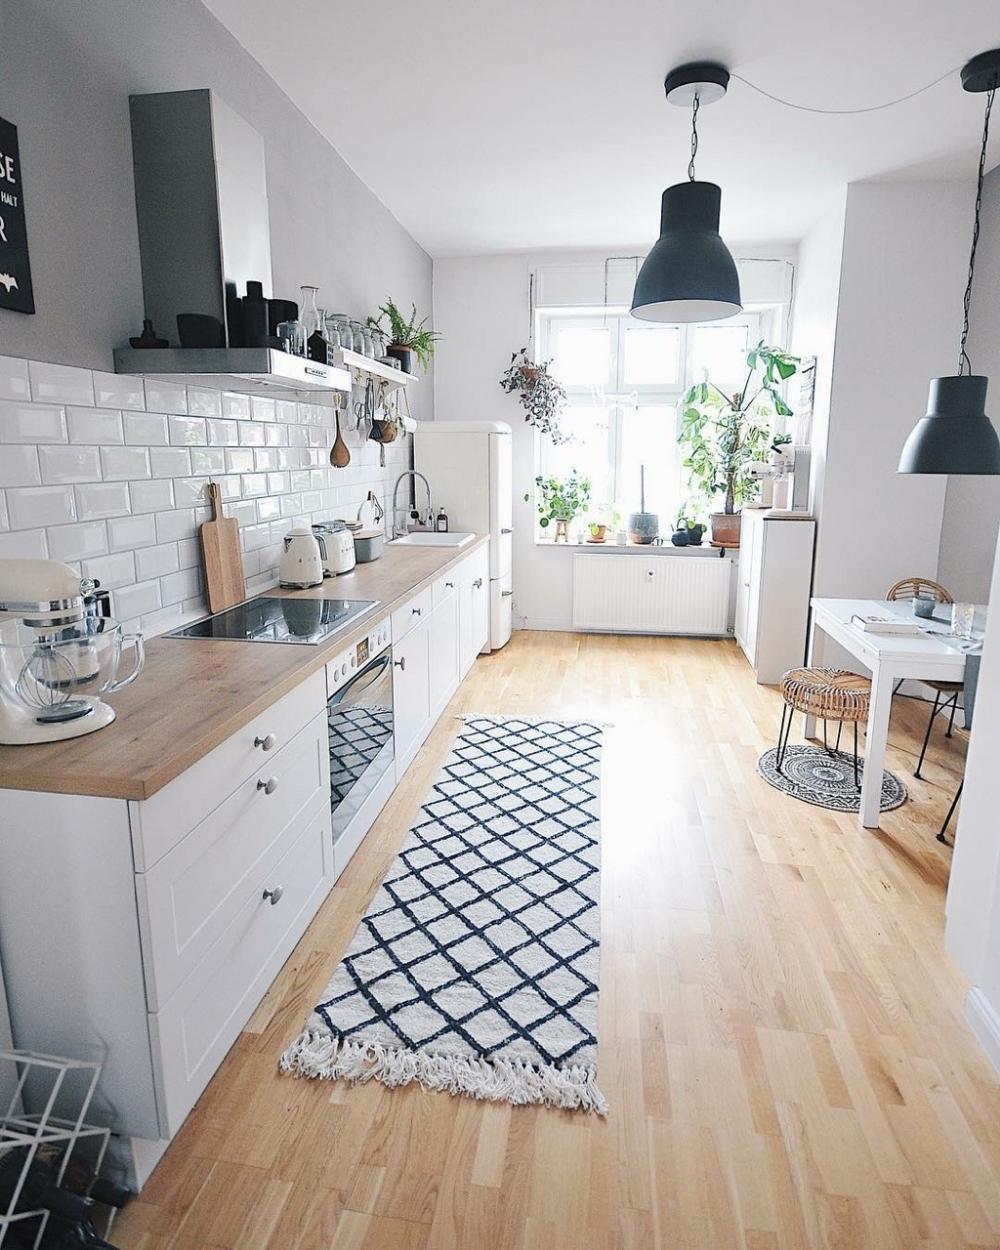 Kitchen Inspiration The Perfect Scandinavian Style Home Kitchen Design Small Home Decor Kitchen Interior Design Kitchen